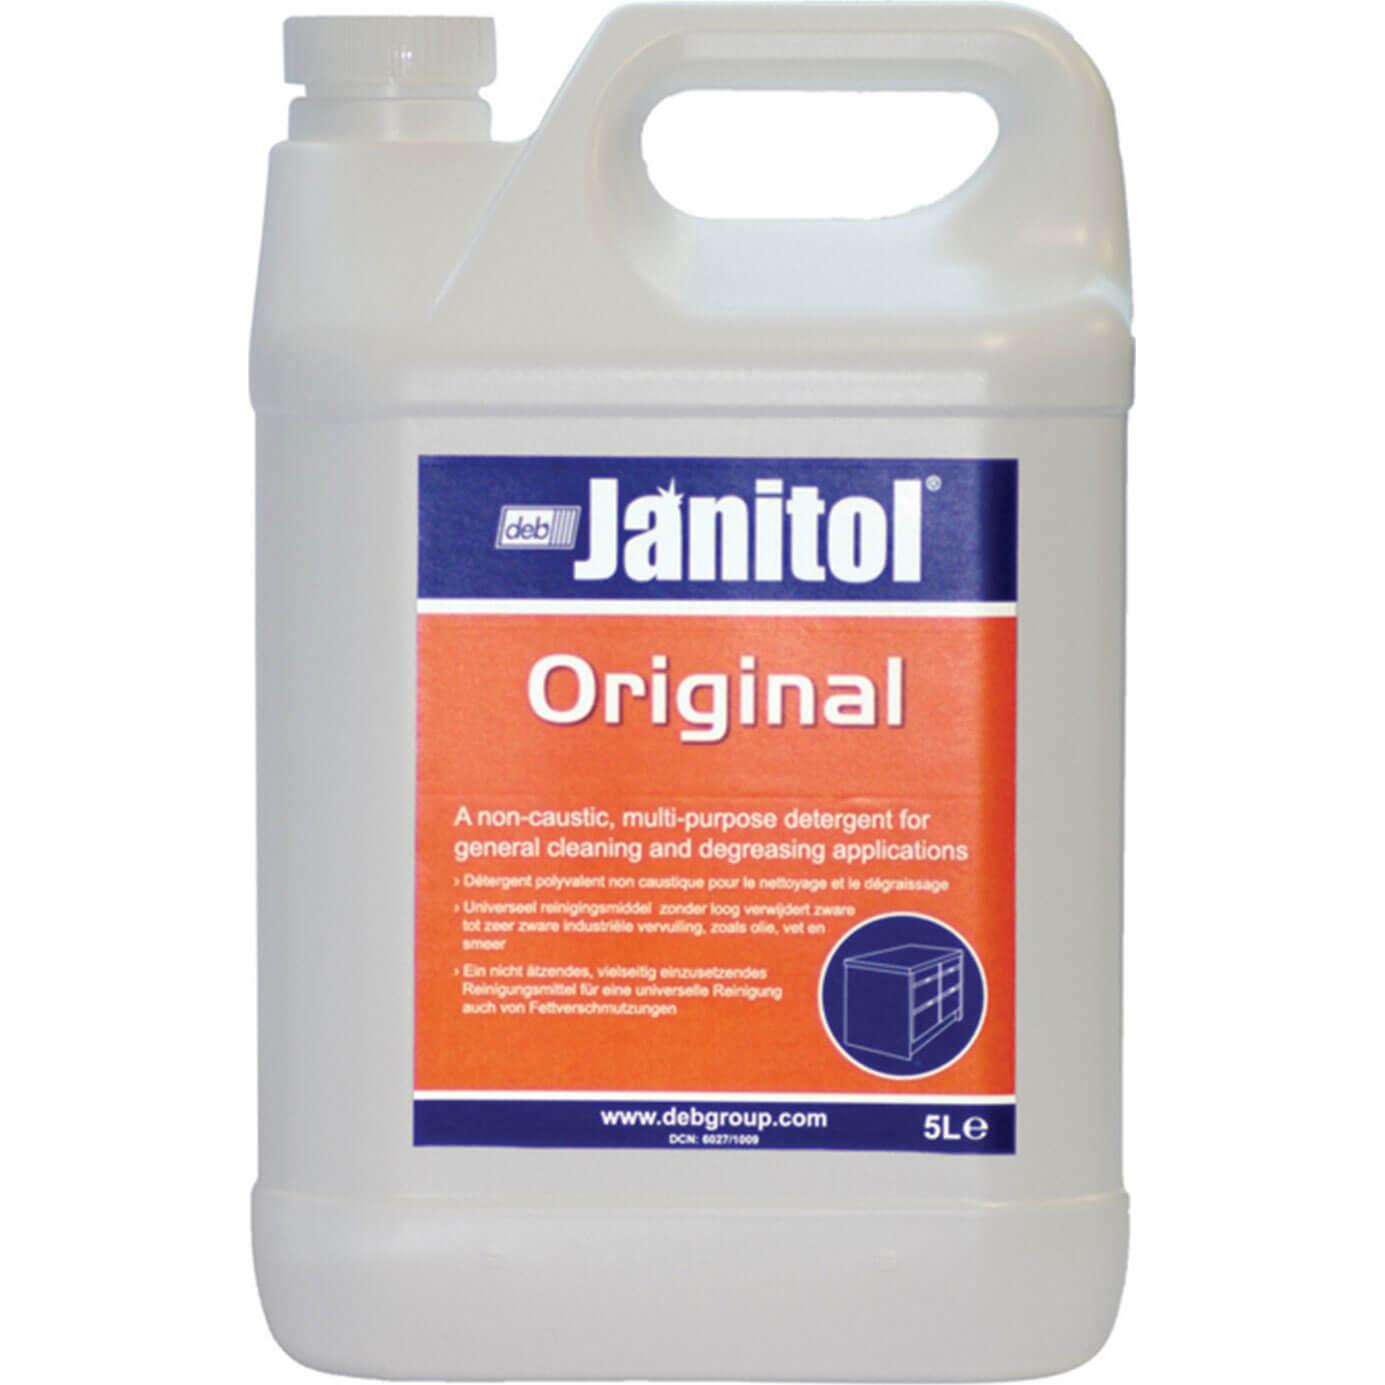 Image of Swarfega Janitol Original Detergent 5L